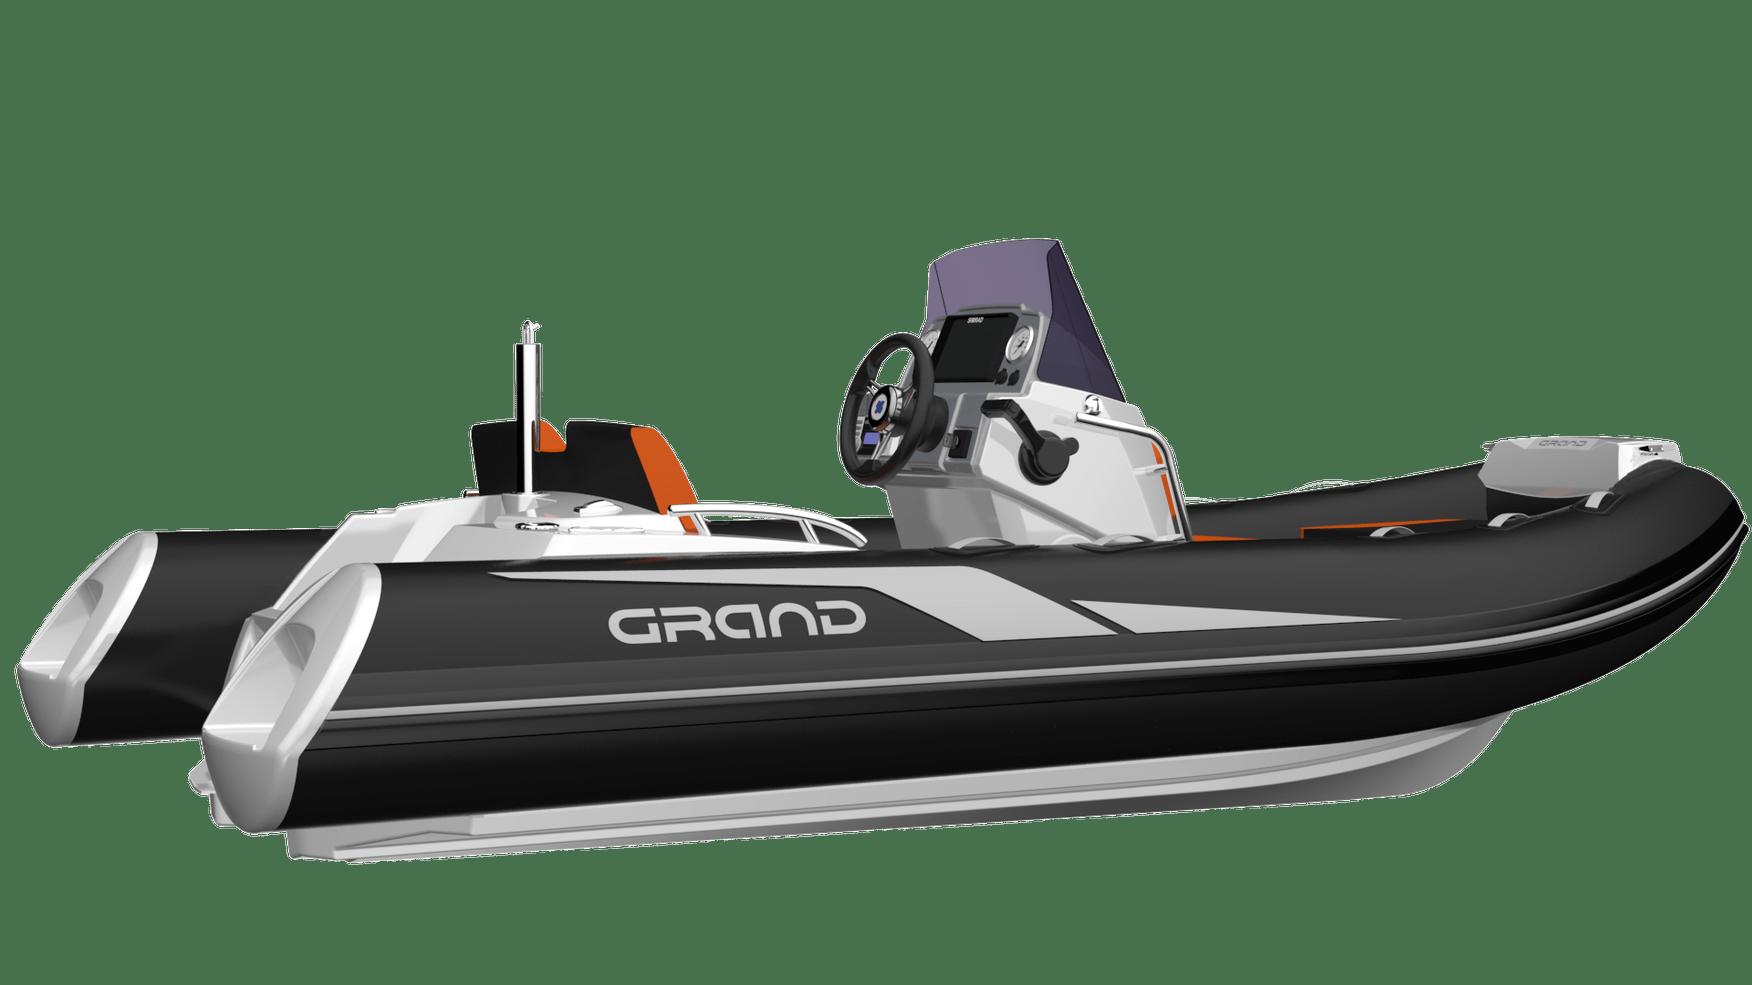 G420_8-1